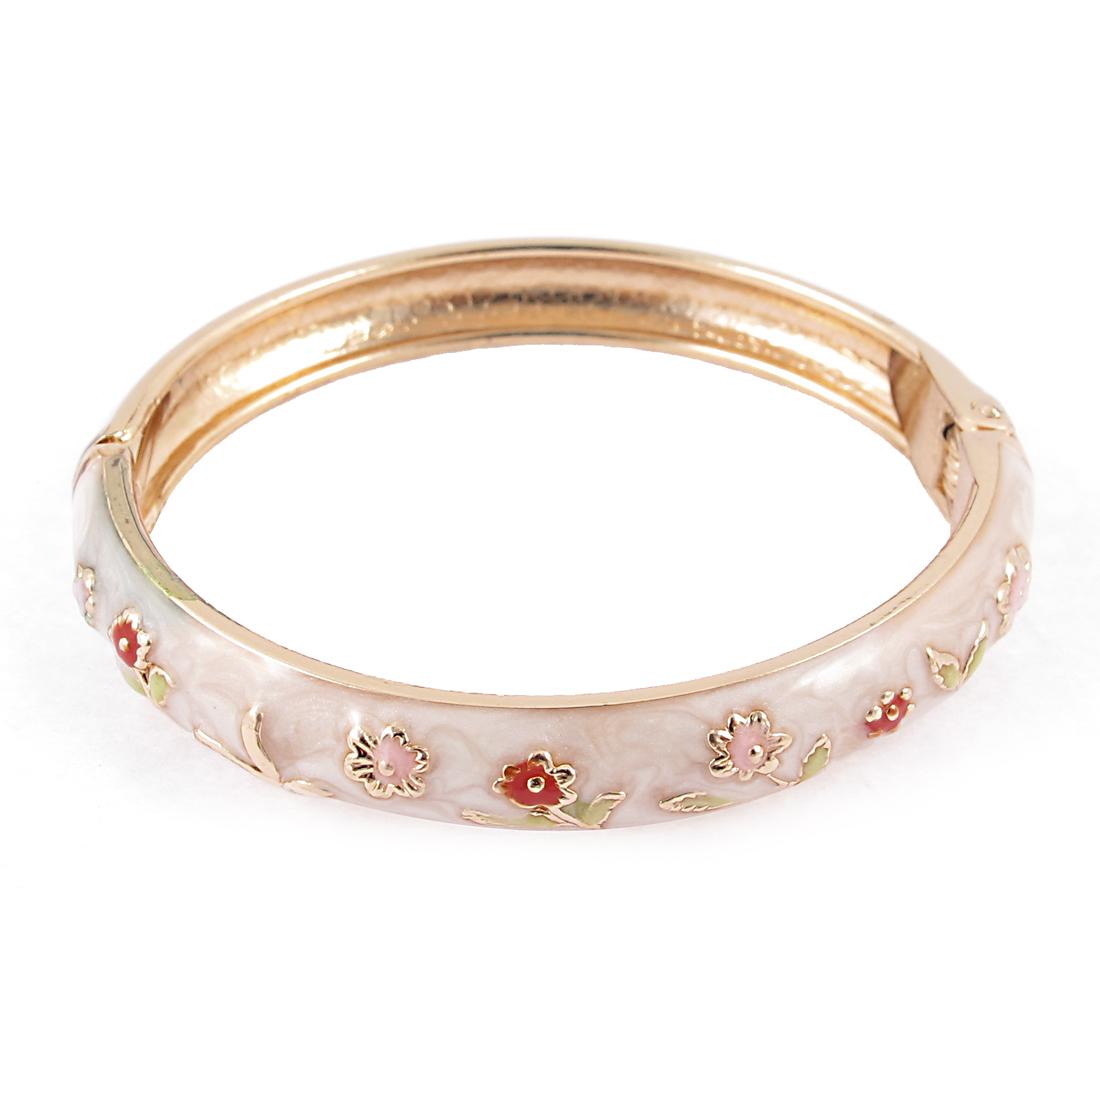 Girl Spring Closure Flower Enamel Round Bracelet Bangle Jewelry Gift Beige